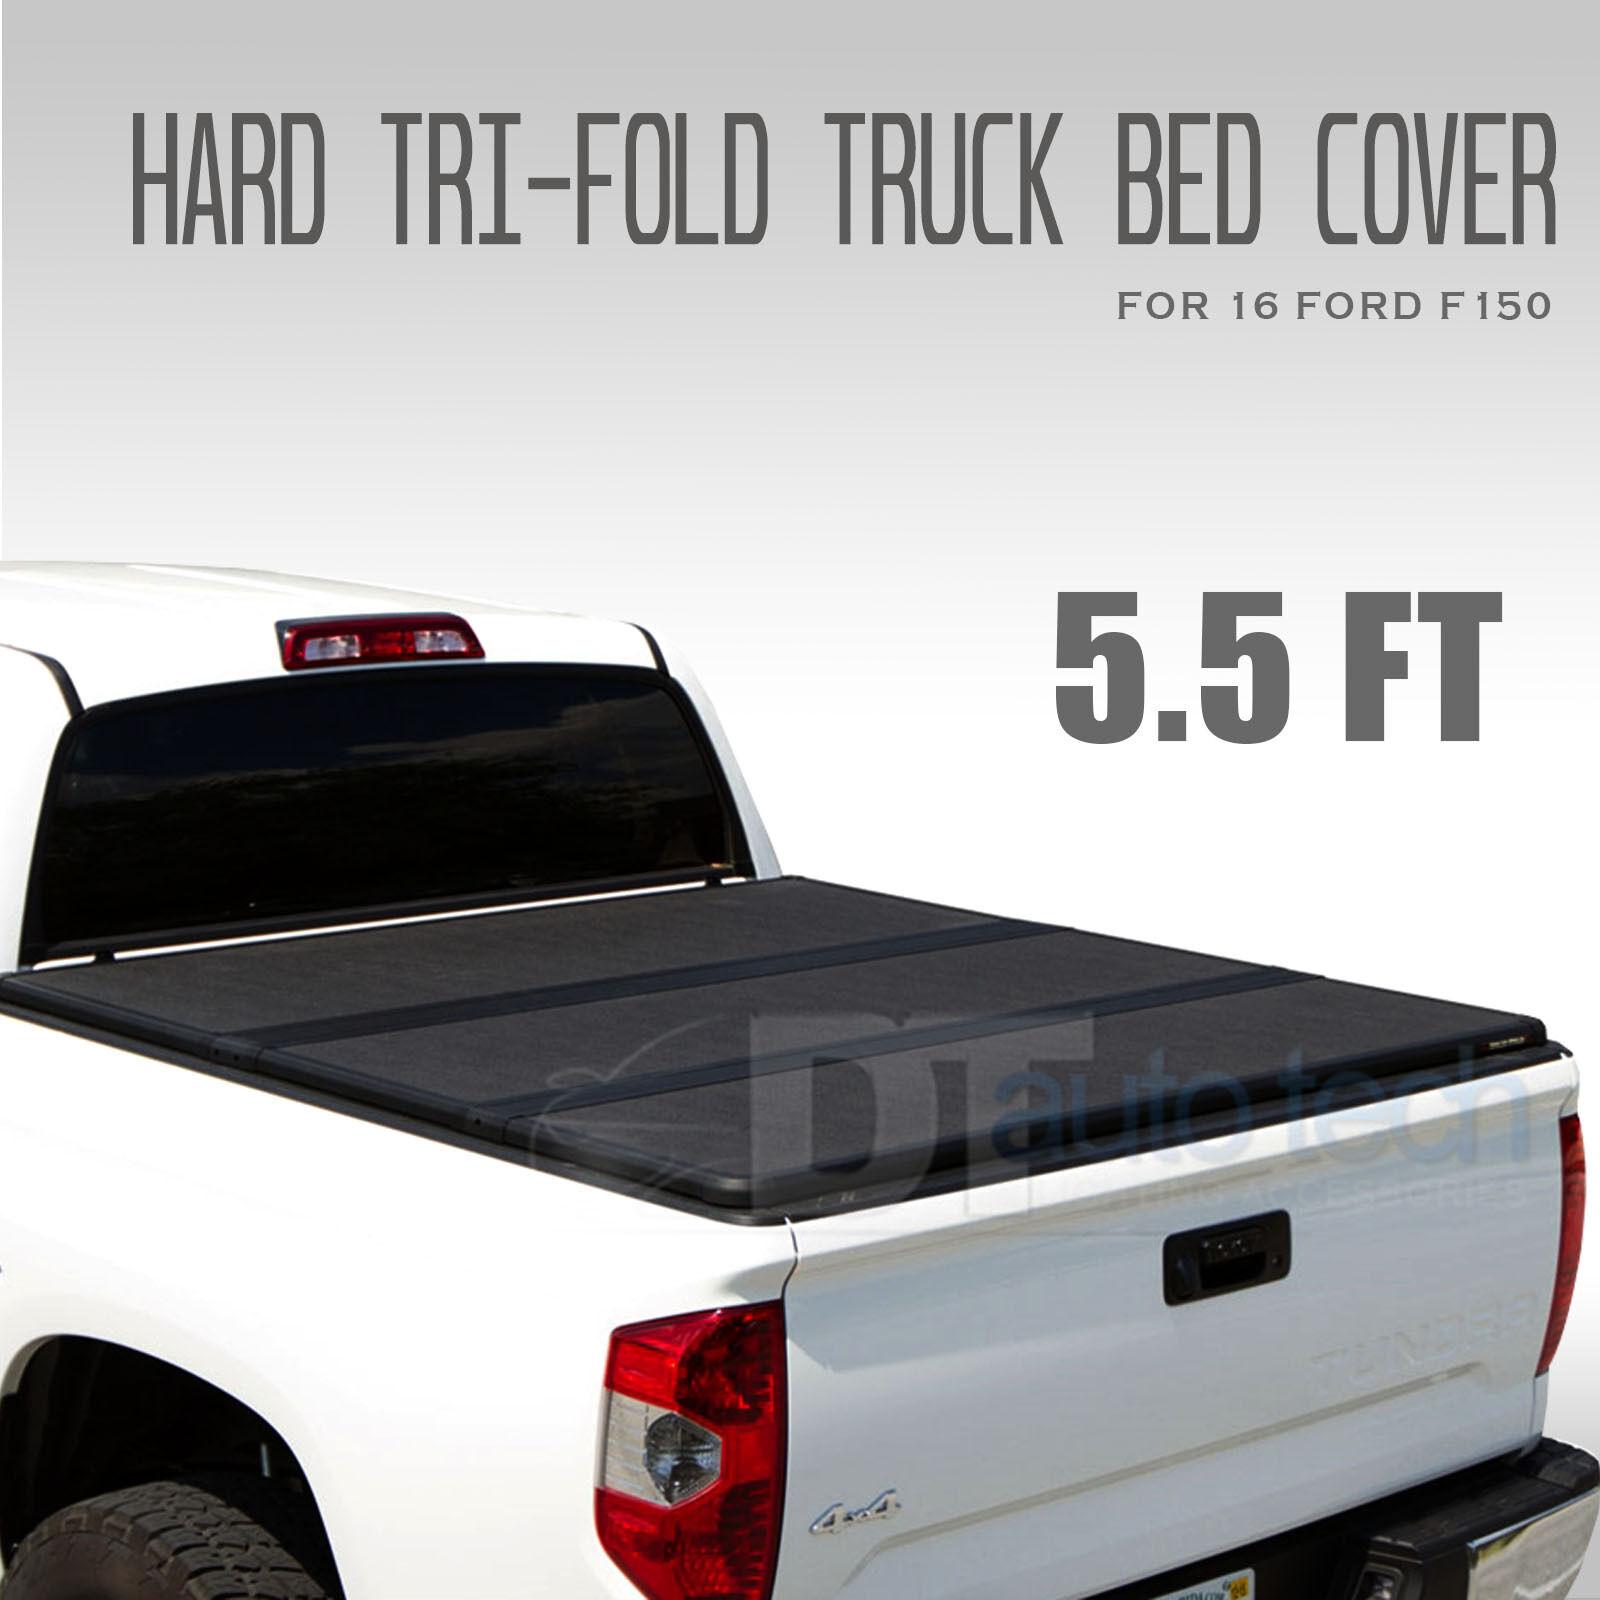 2017 Silverado Tonneau Cover >> 2004-2018 Ford F-150 Lock Hard Solid Tri-Fold Tonneau Cover 5.5ft Truck Bed 612520698997   eBay